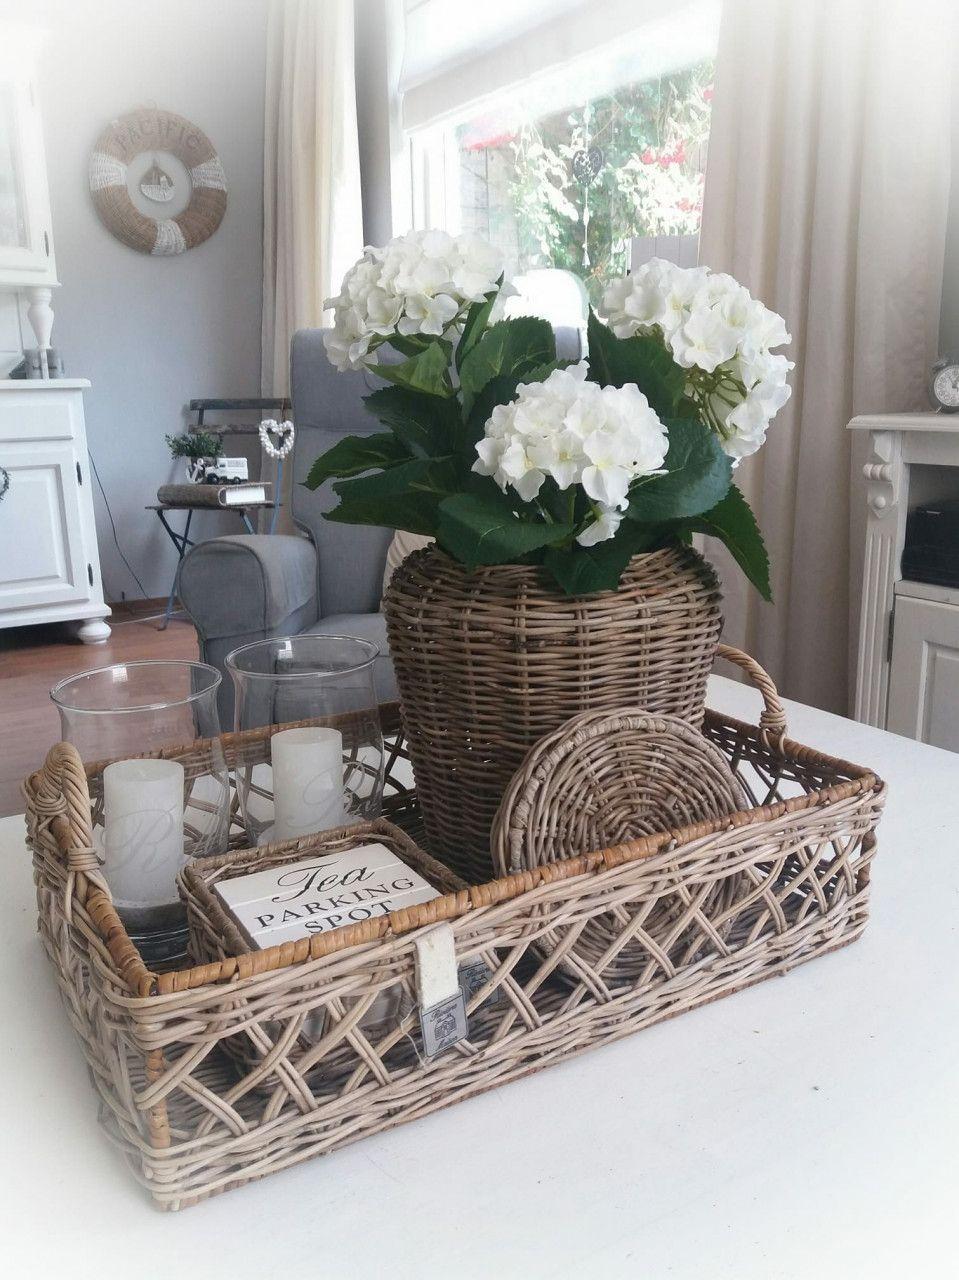 42 Tutorial Best 201 Beautiful Coffee Table Decor Tray 2020 In 2020 Tafeldecoraties Woonkamer Decoratie Mand Decoratie